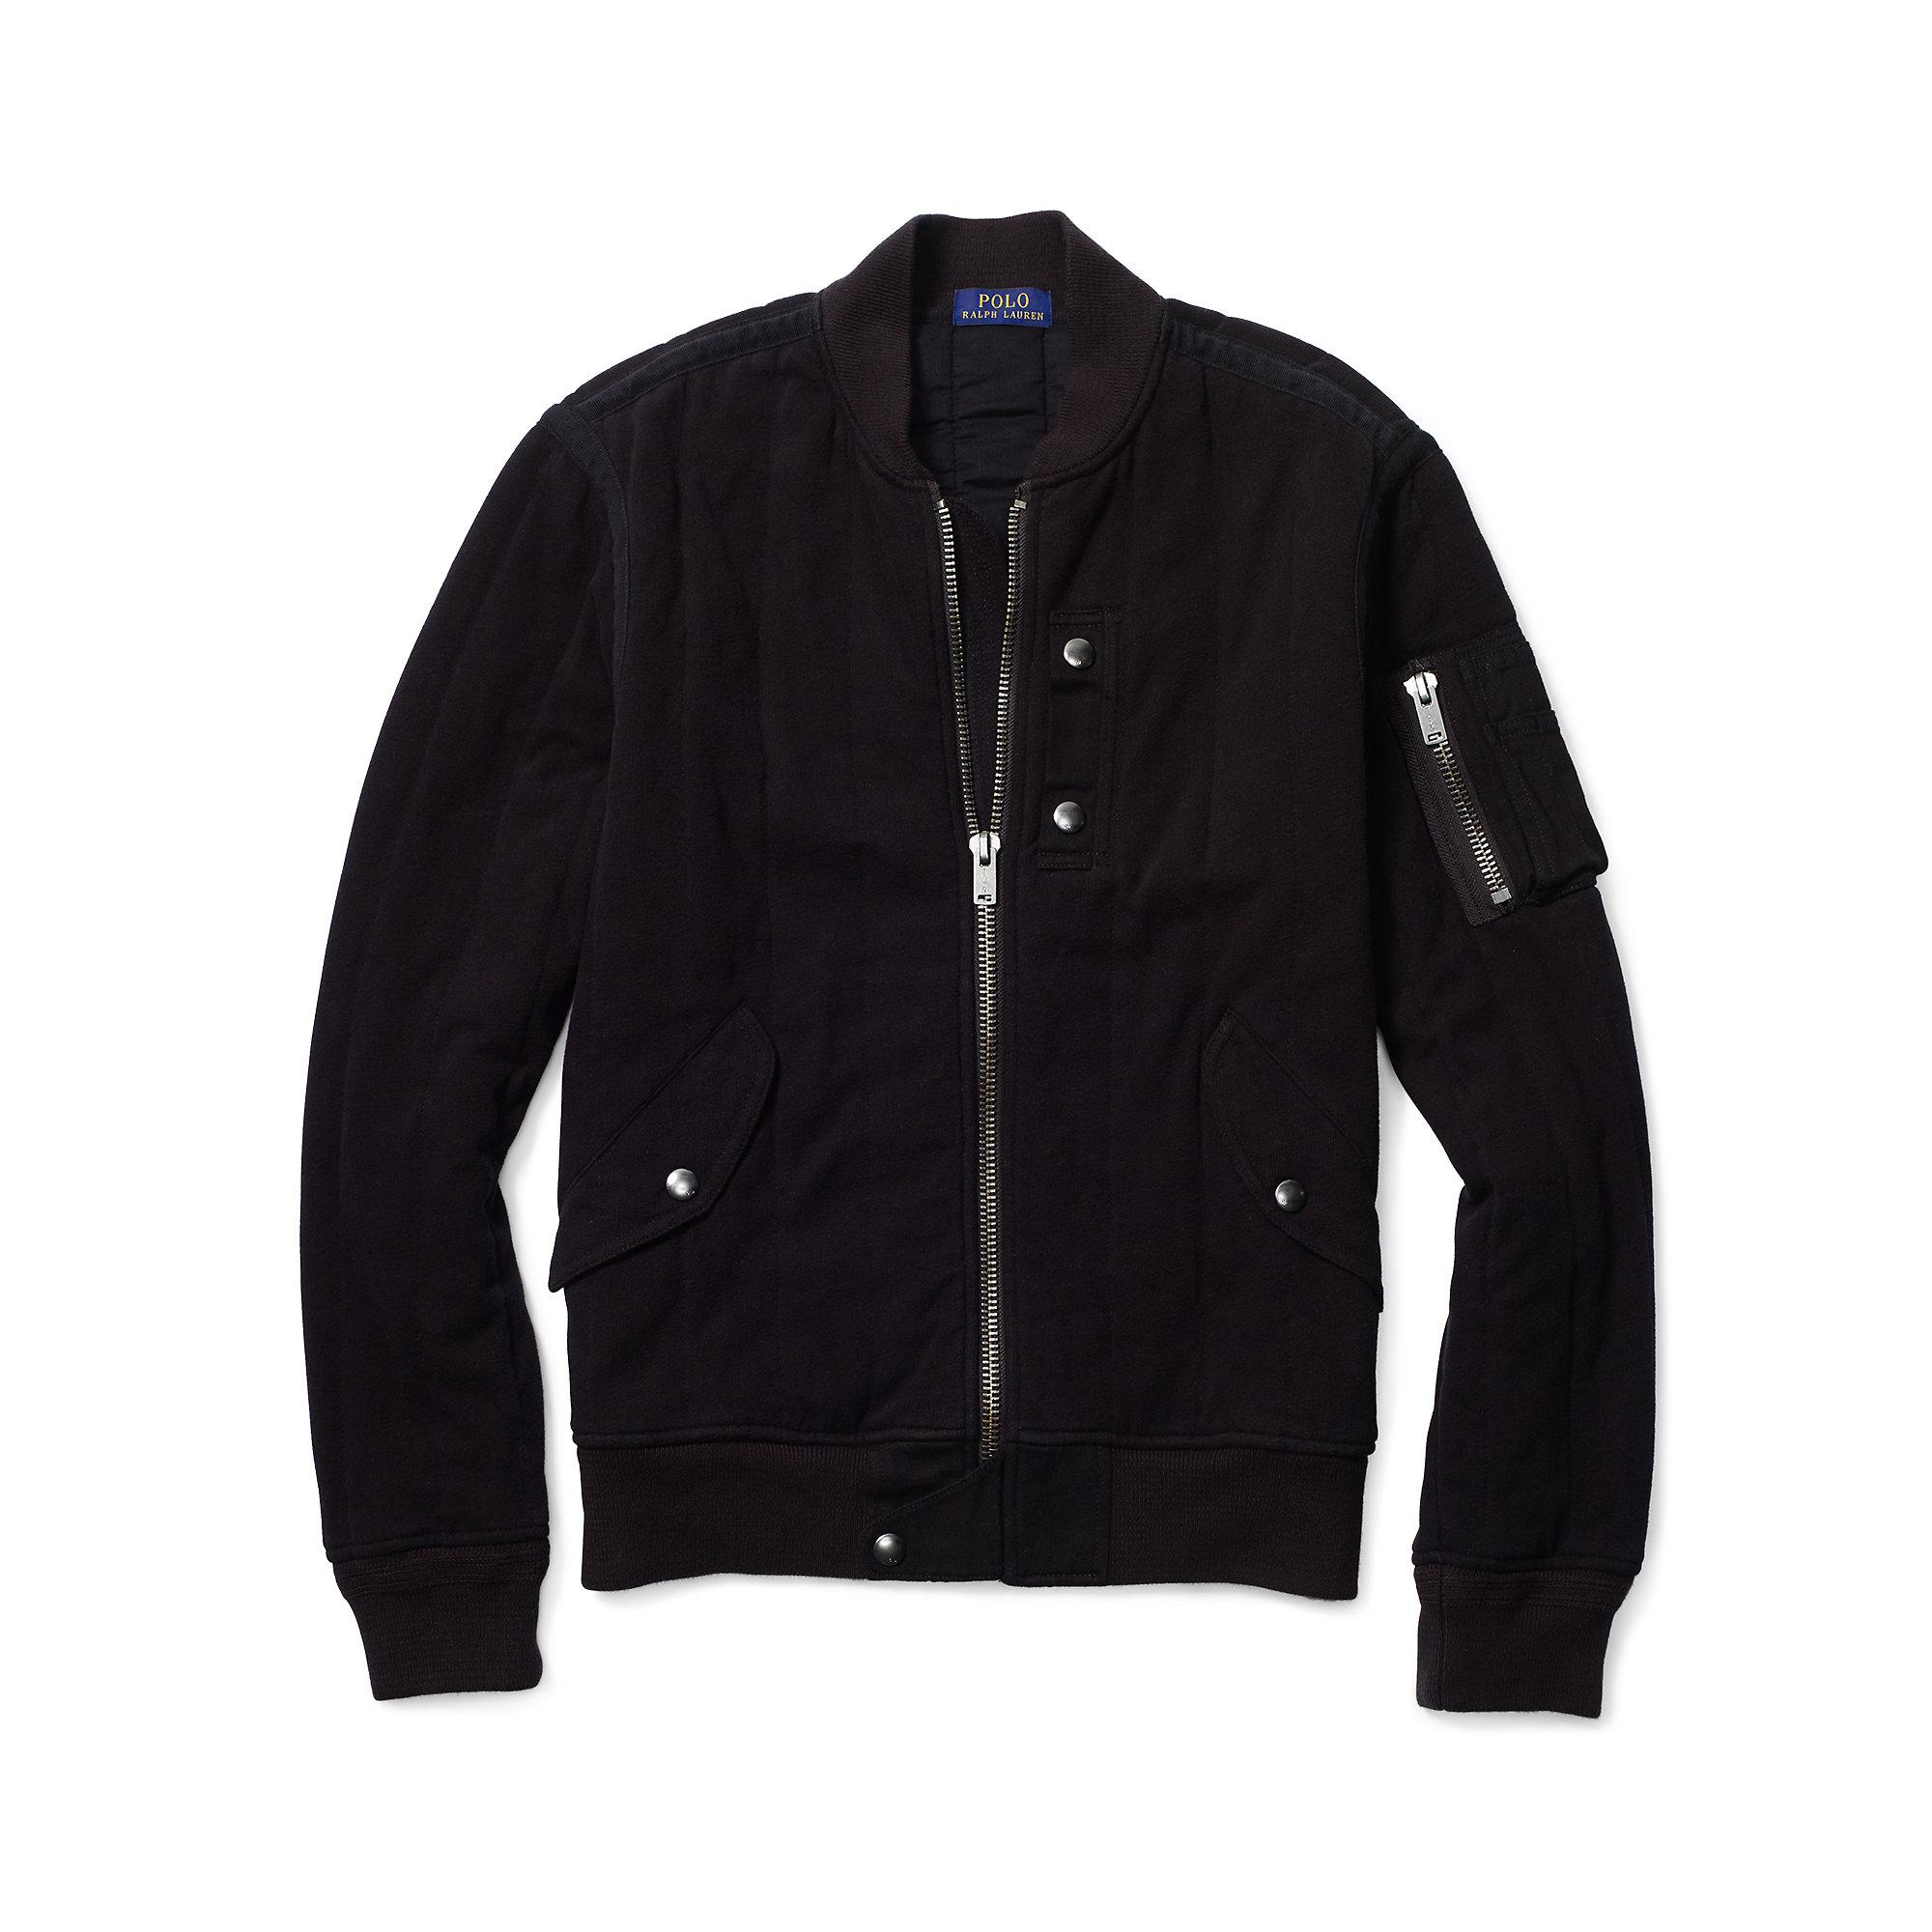 polo ralph lauren jersey bomber jacket in black lyst. Black Bedroom Furniture Sets. Home Design Ideas